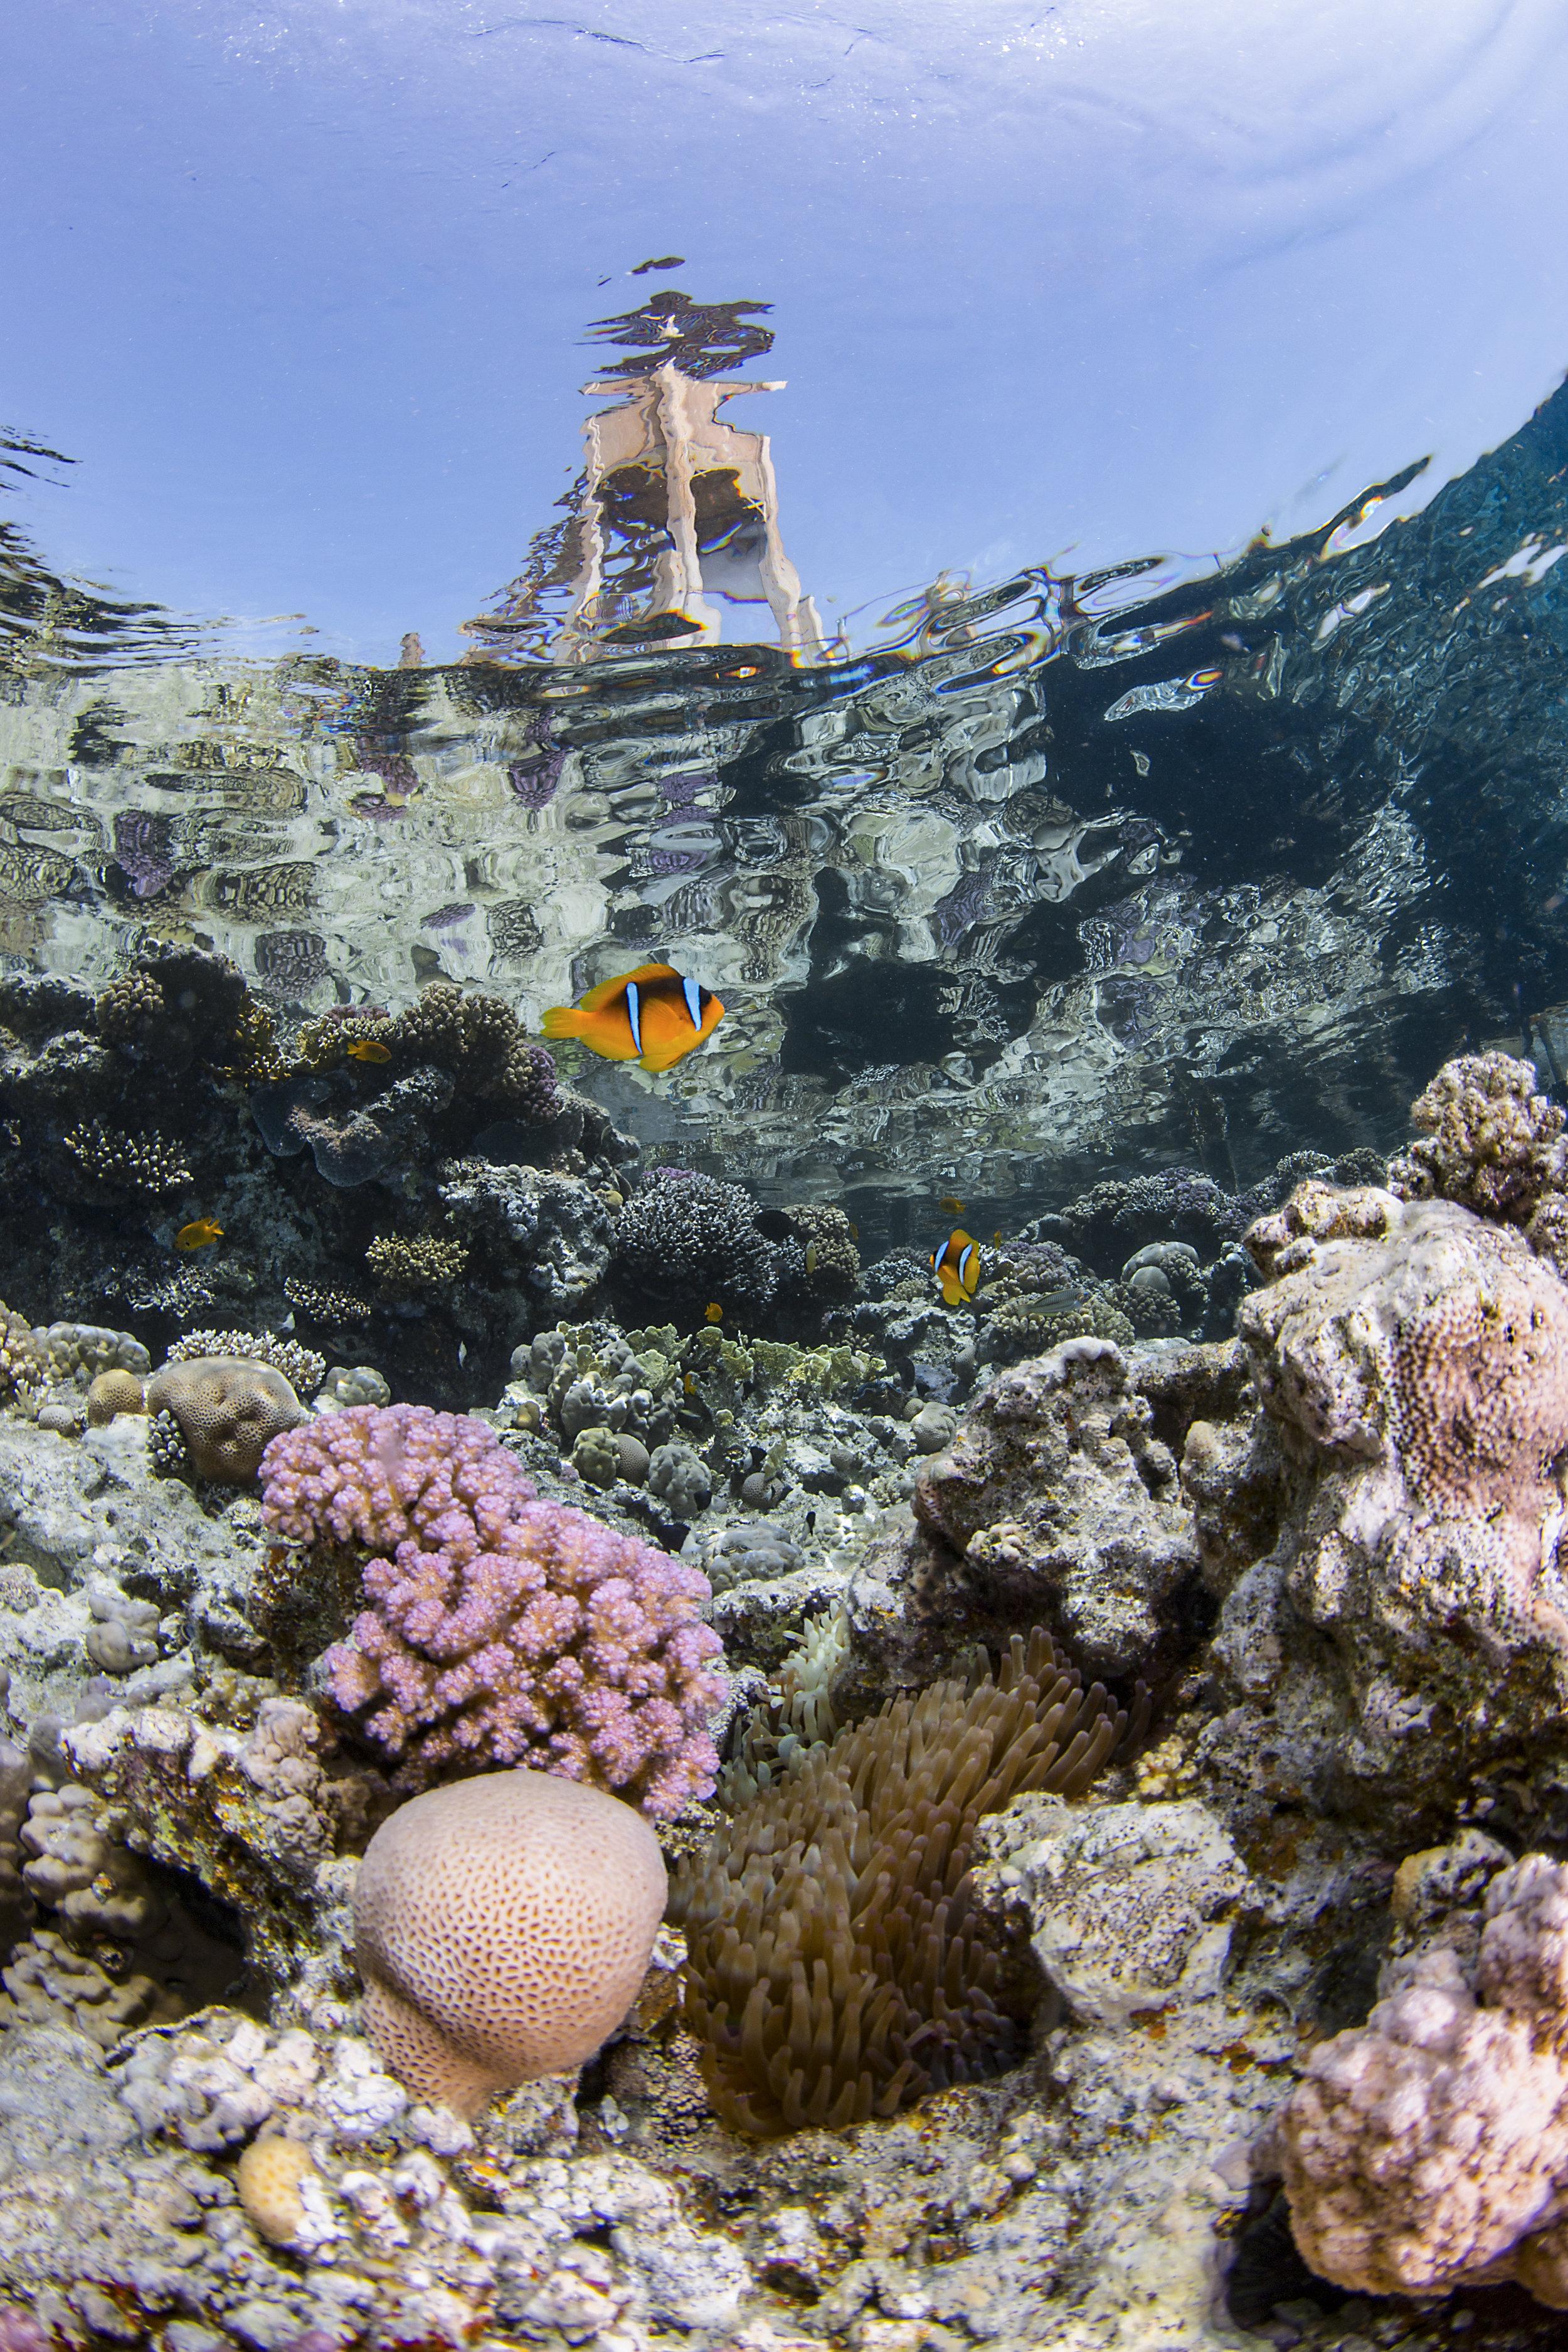 Ras Umm sid, sharmel sheikh credit: Renata romeo / coral reef image bank